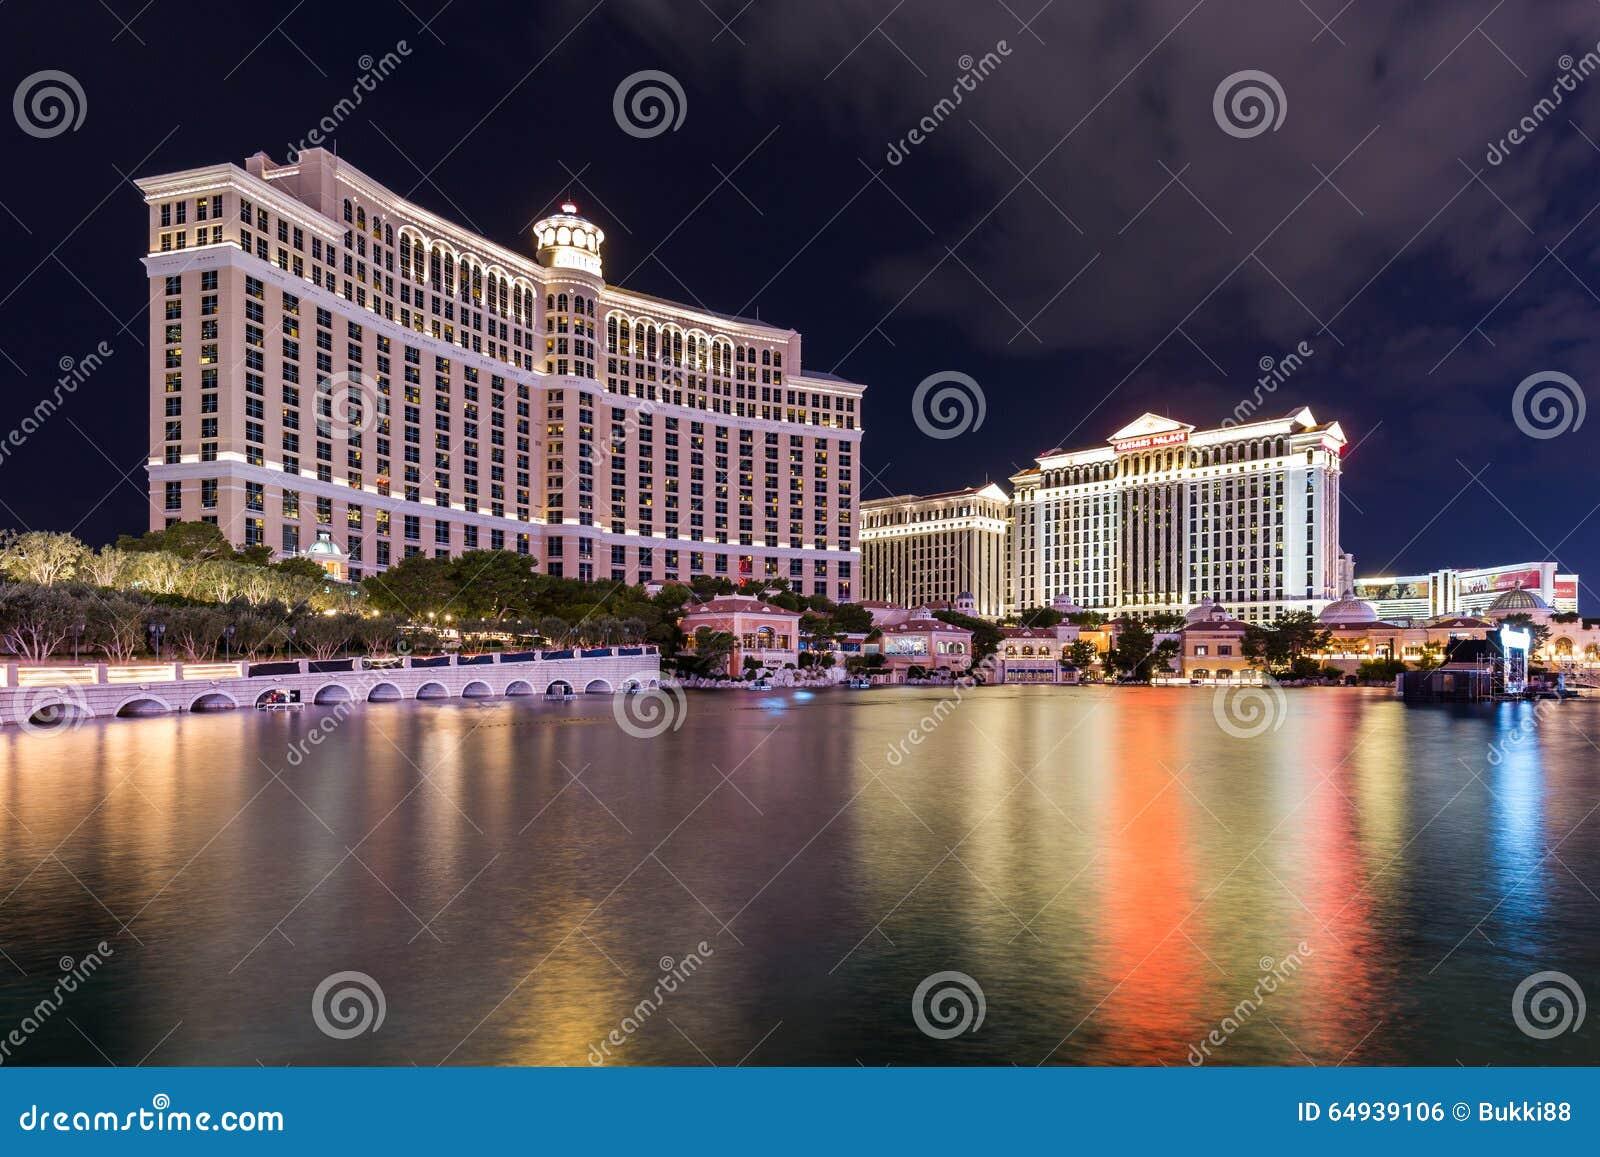 Las Vegas, Nevada Hotels from $18! - Cheap Hotel Deals